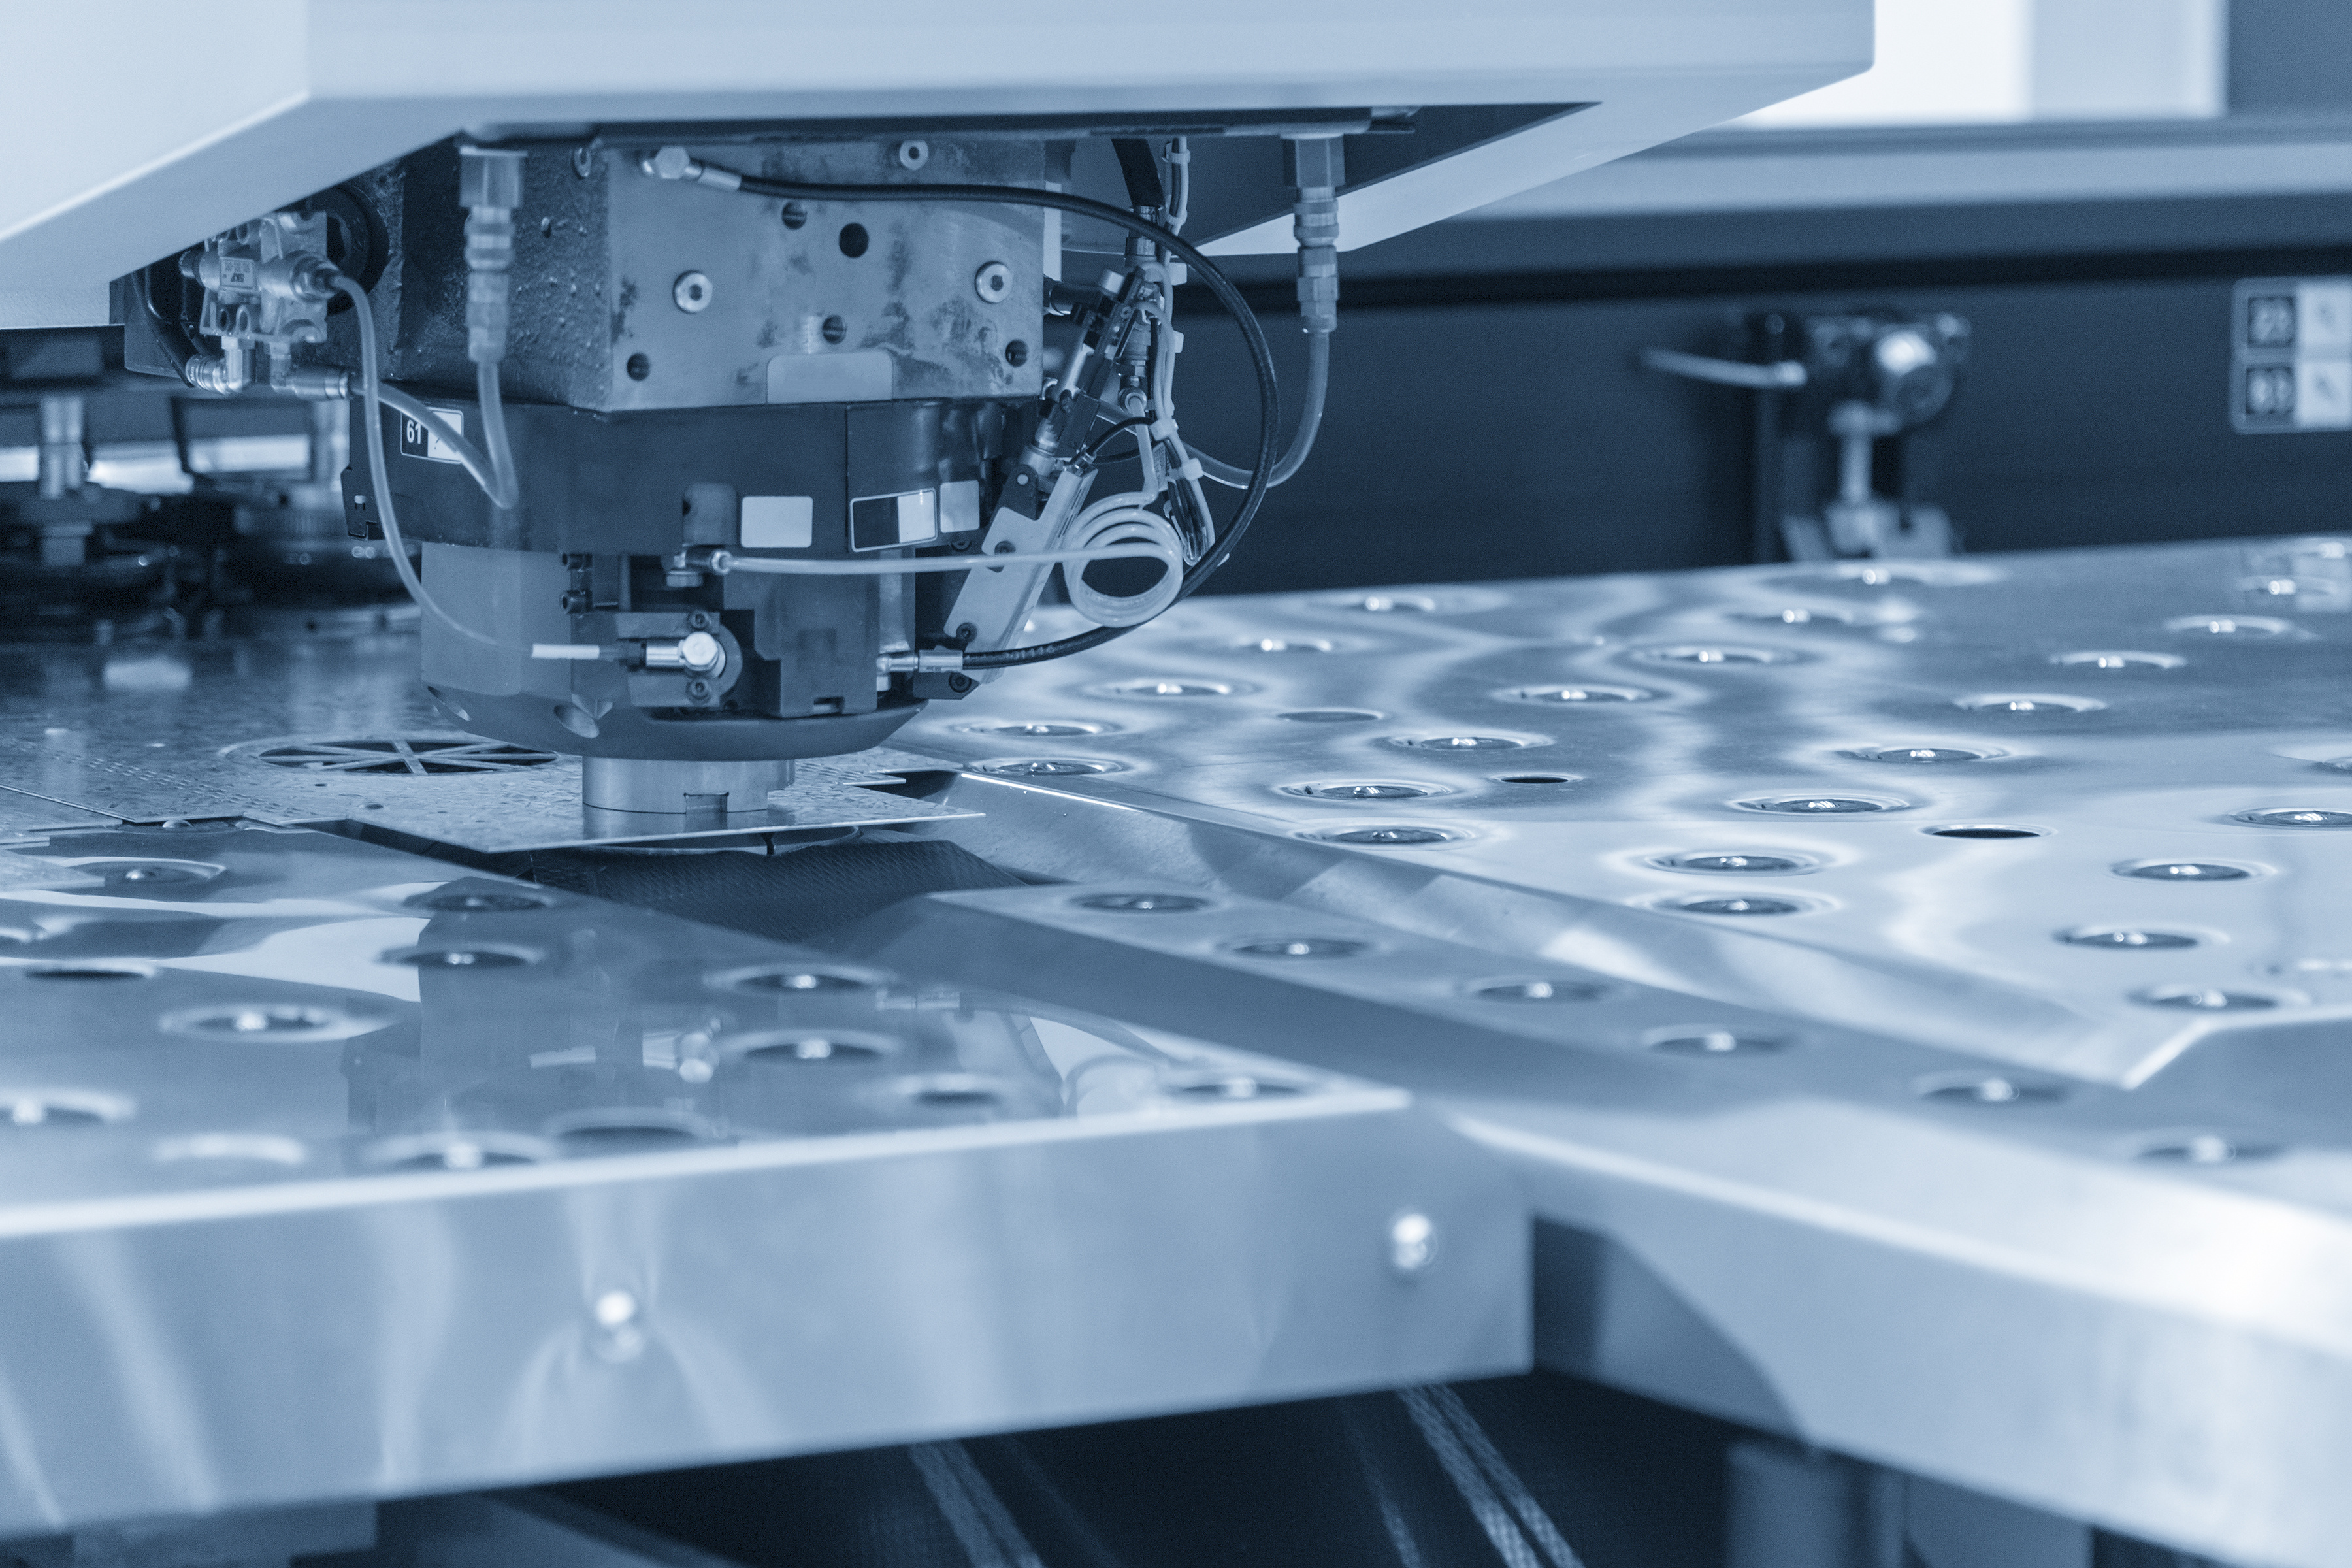 The hi-speed turret punching machine for sheet metal piercing process control by CNC program. The modern sheet metal production by turret punching machine.